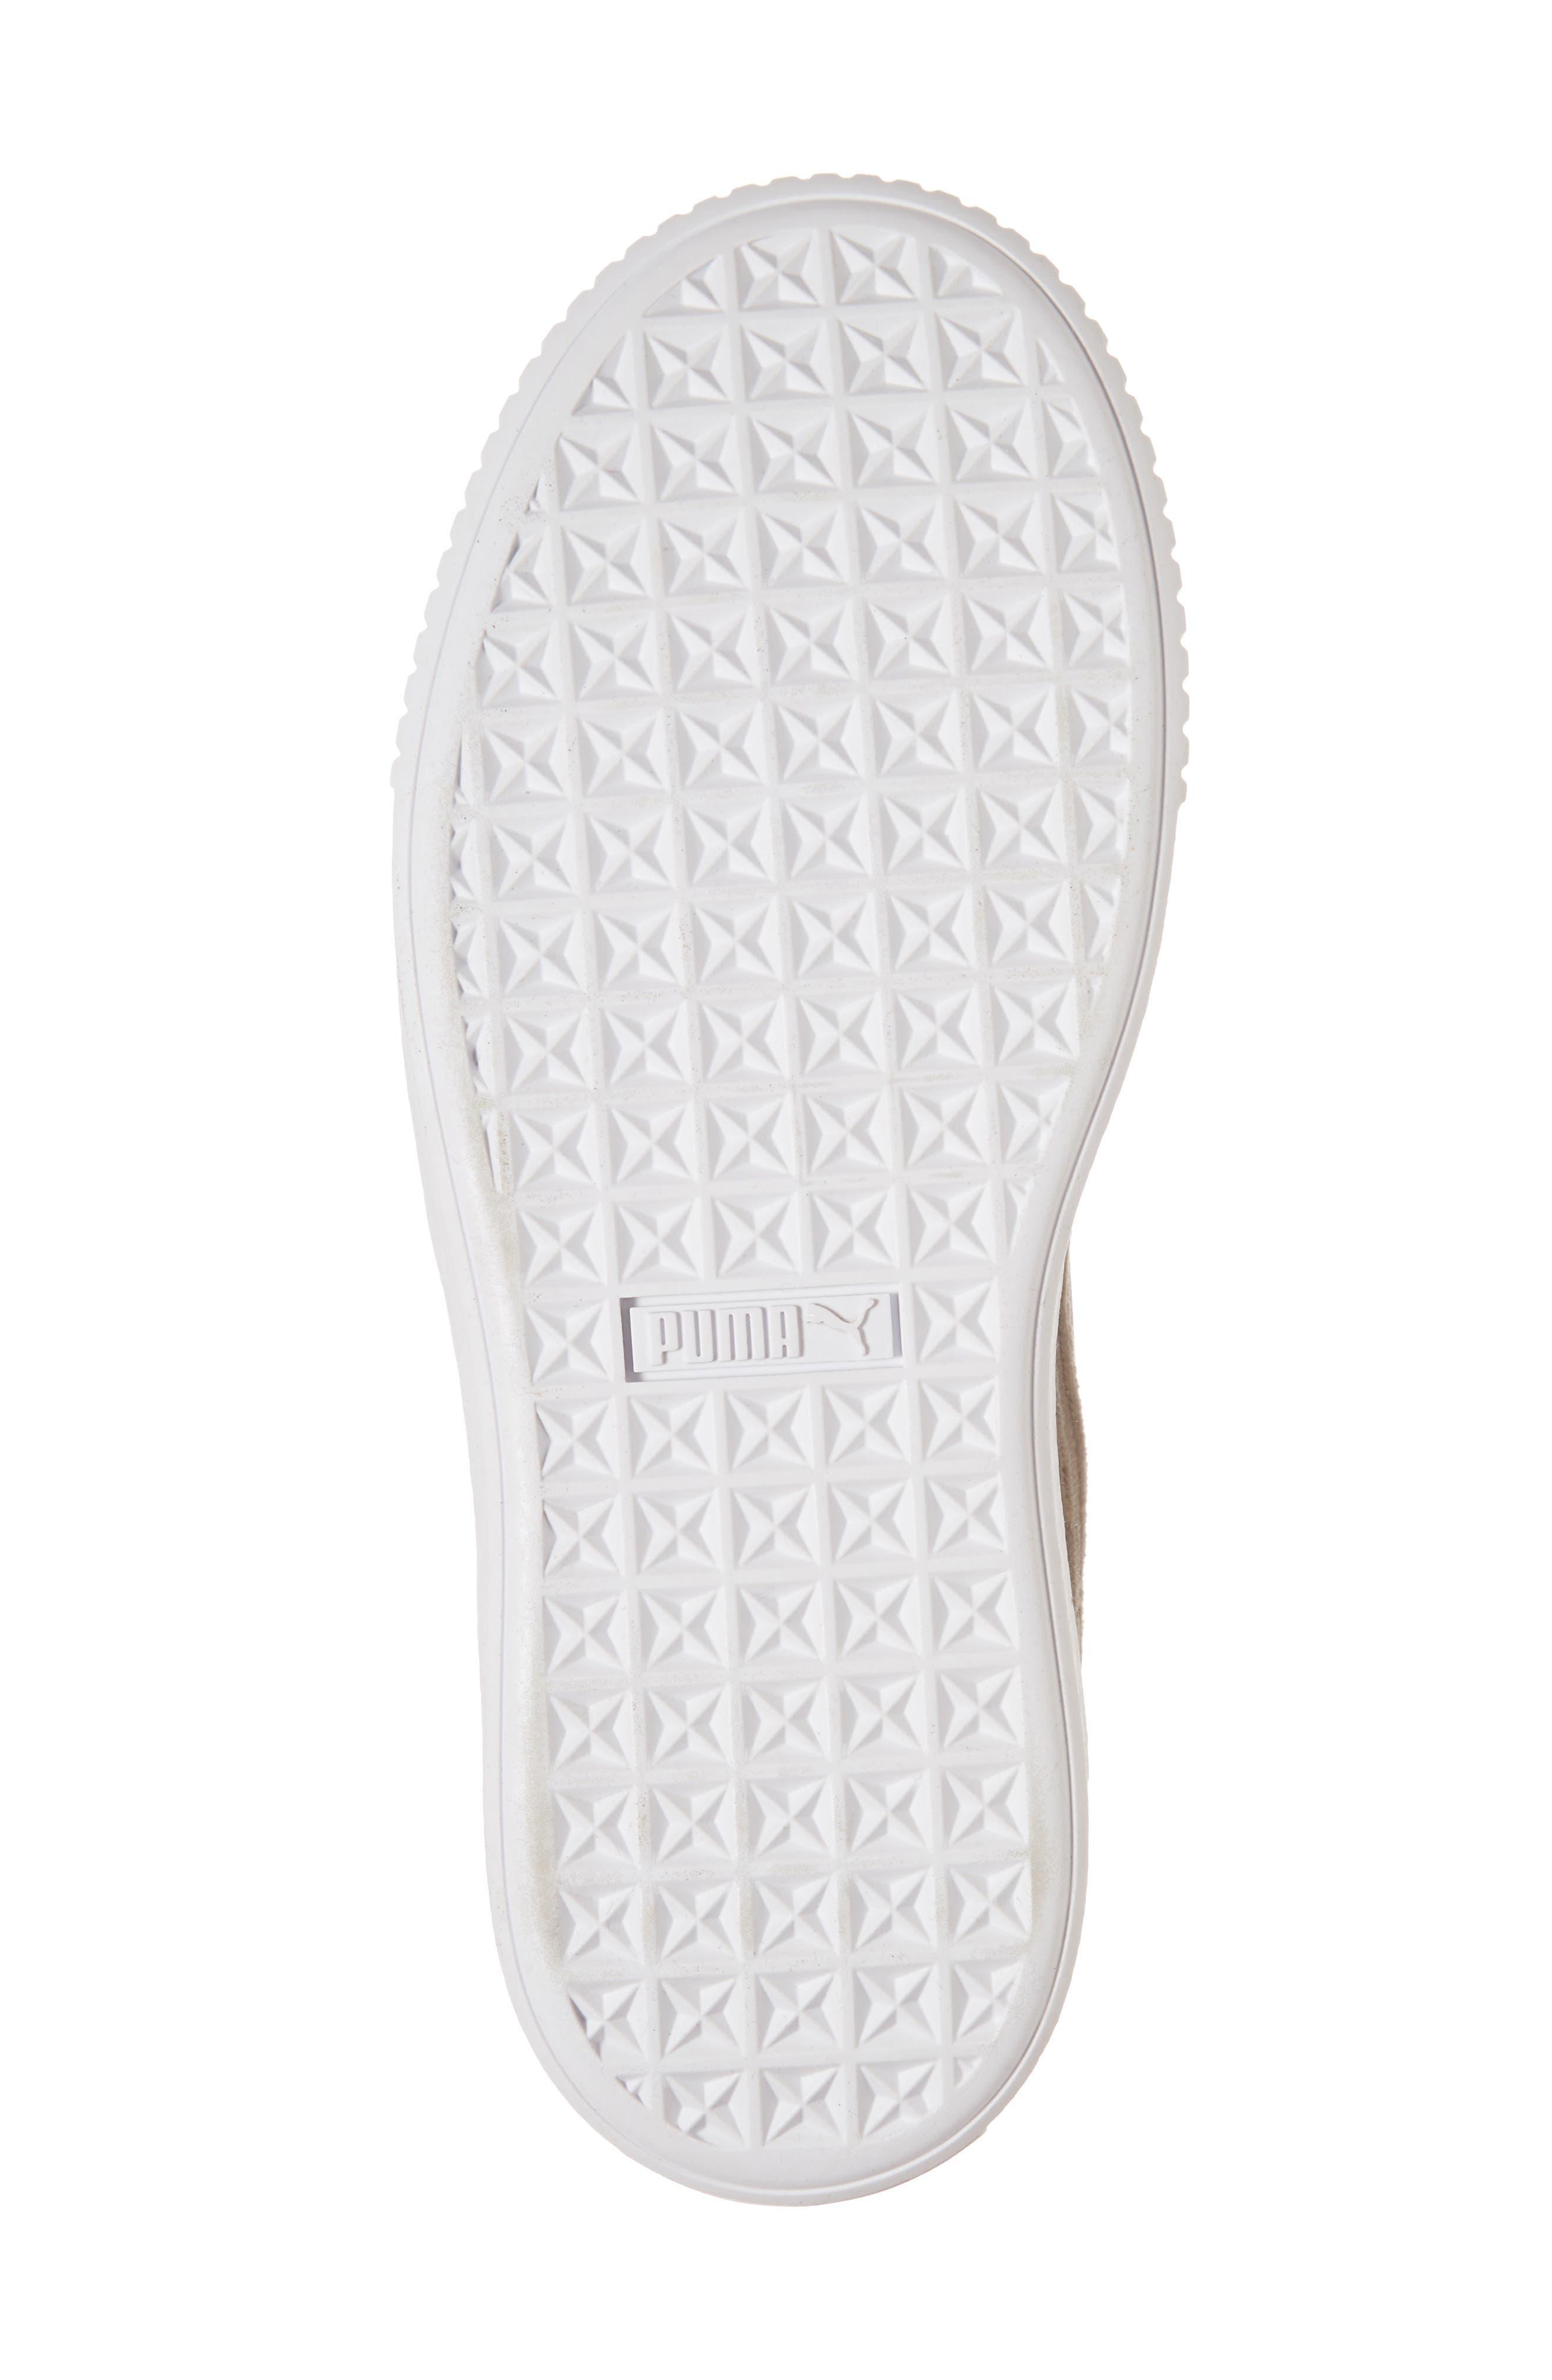 Platform Hyper Embroidered Sneaker,                             Alternate thumbnail 11, color,